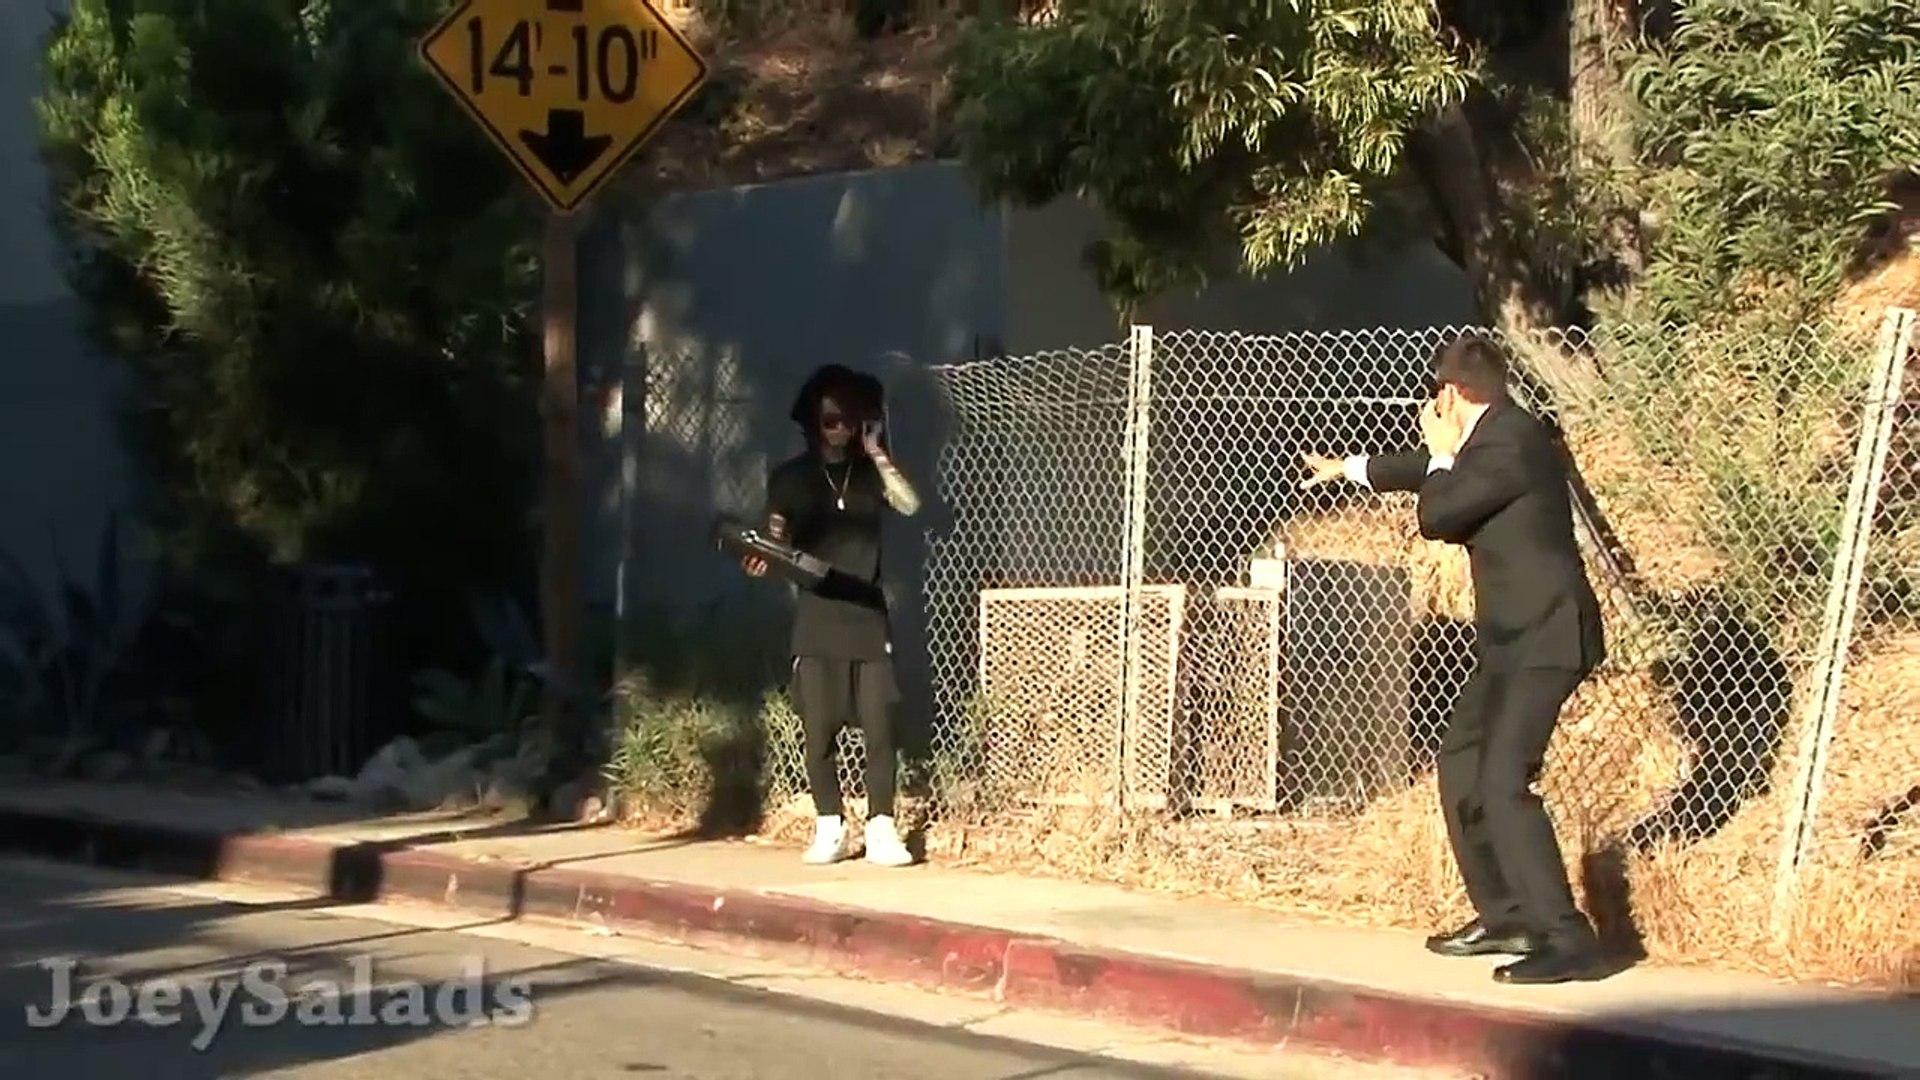 FBI Drug Deal in the Hood Pranks on People Funny Videos Funny Pranks Best Pranks 2014